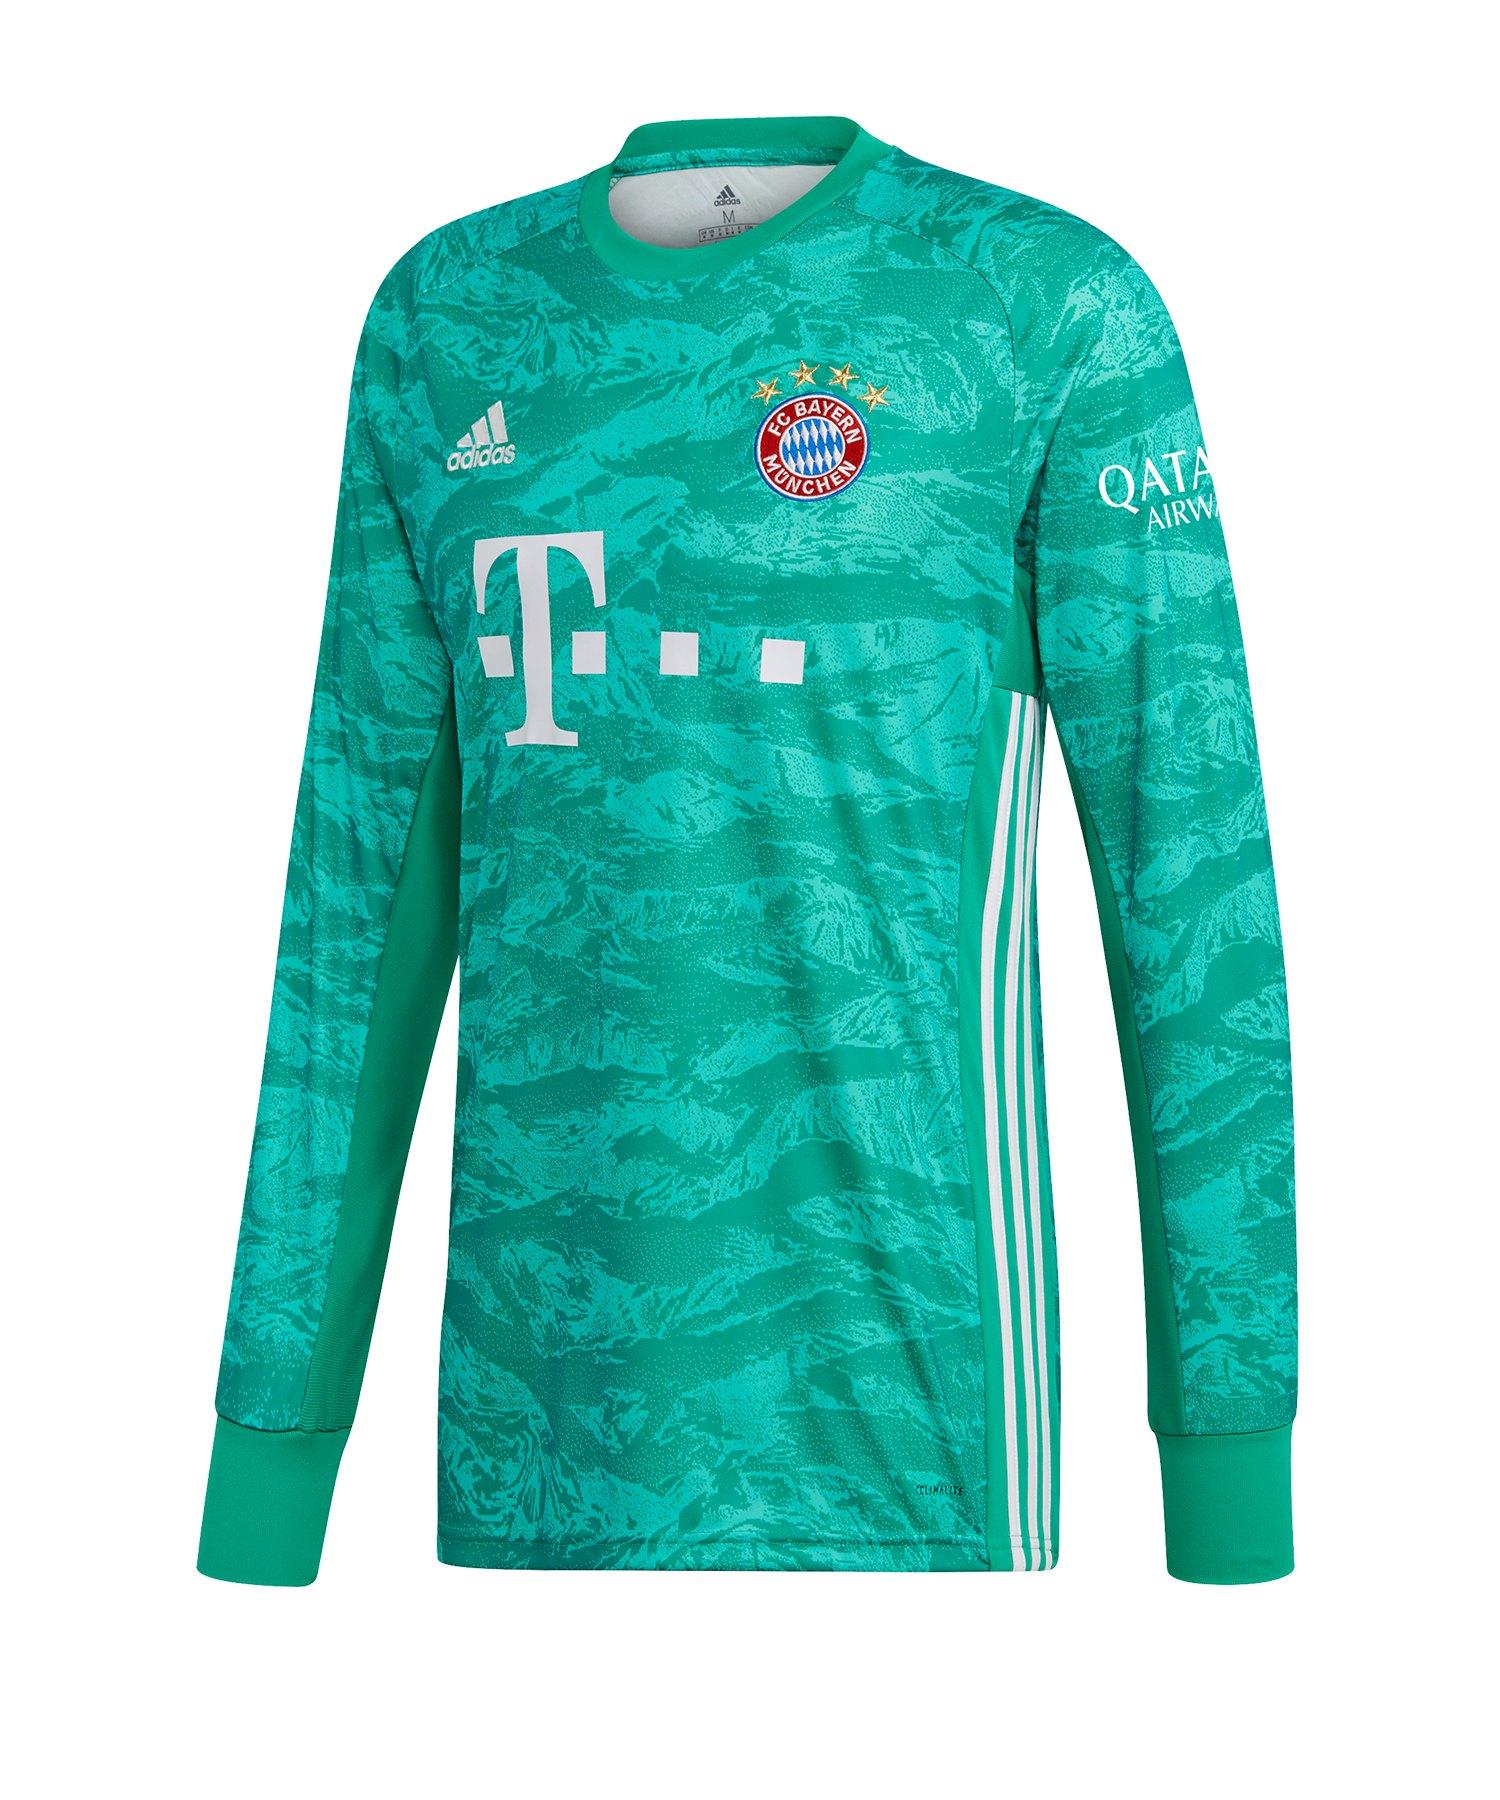 adidas FC Bayern München Torwarttrikot 2019/2020 - Gruen